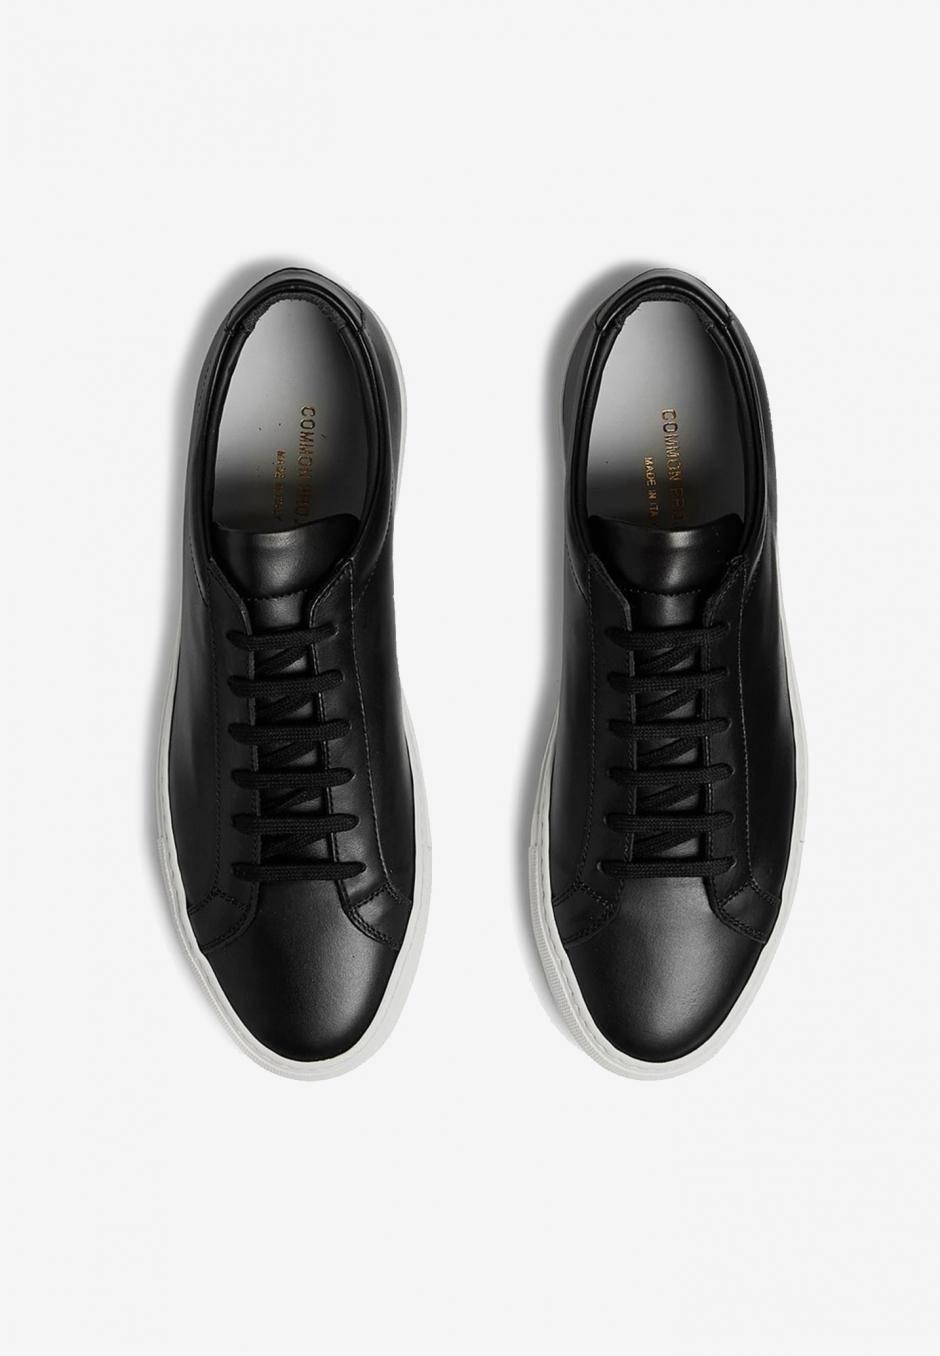 Common Projects Original Achilles Leather Black